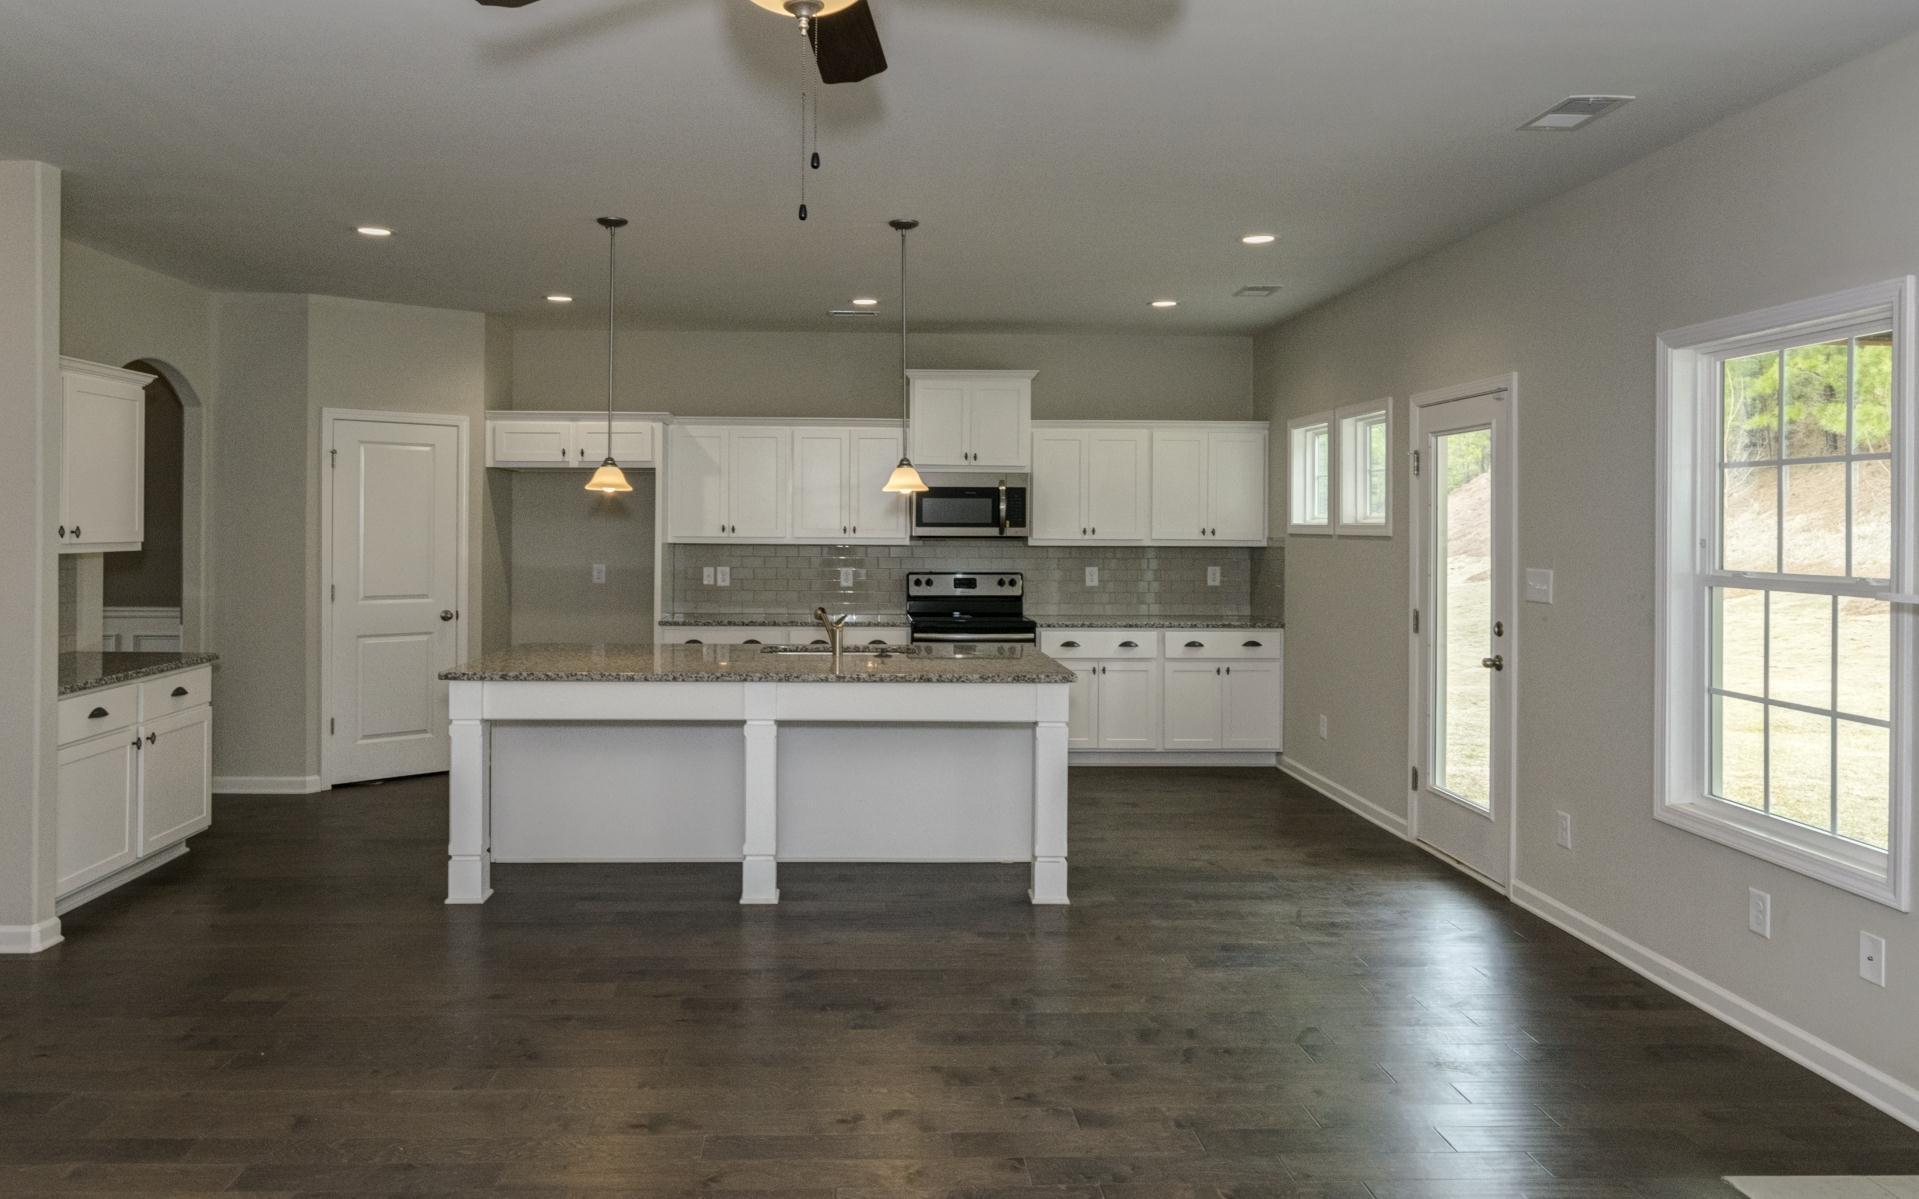 Kitchen featured in the Cannaberra By Hughston Homes in Auburn-Opelika, AL